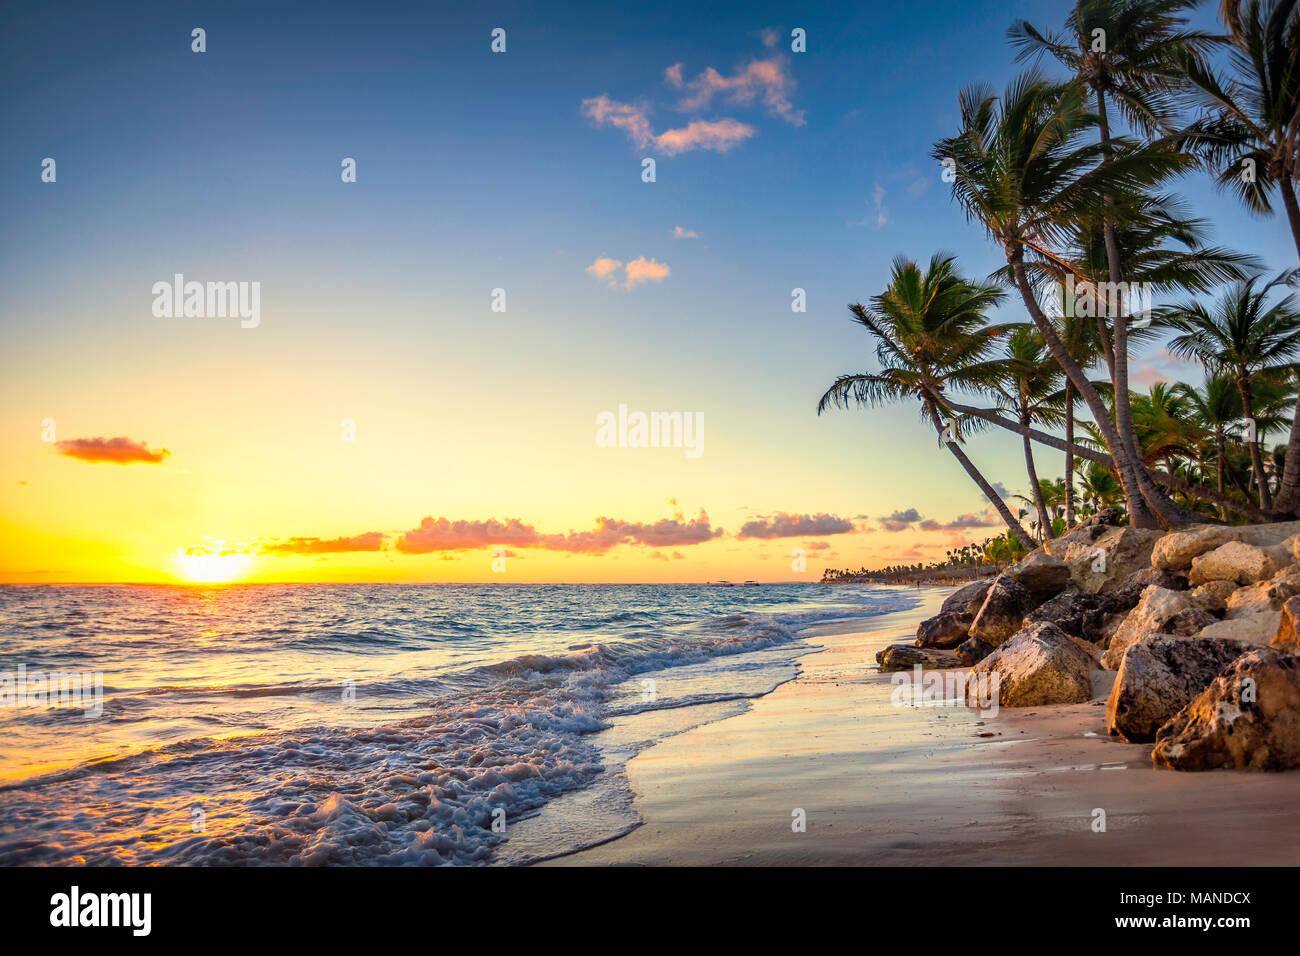 Palm trees on the tropical beach, Bavaro, Punta Cana, Dominican Republic - Stock Image